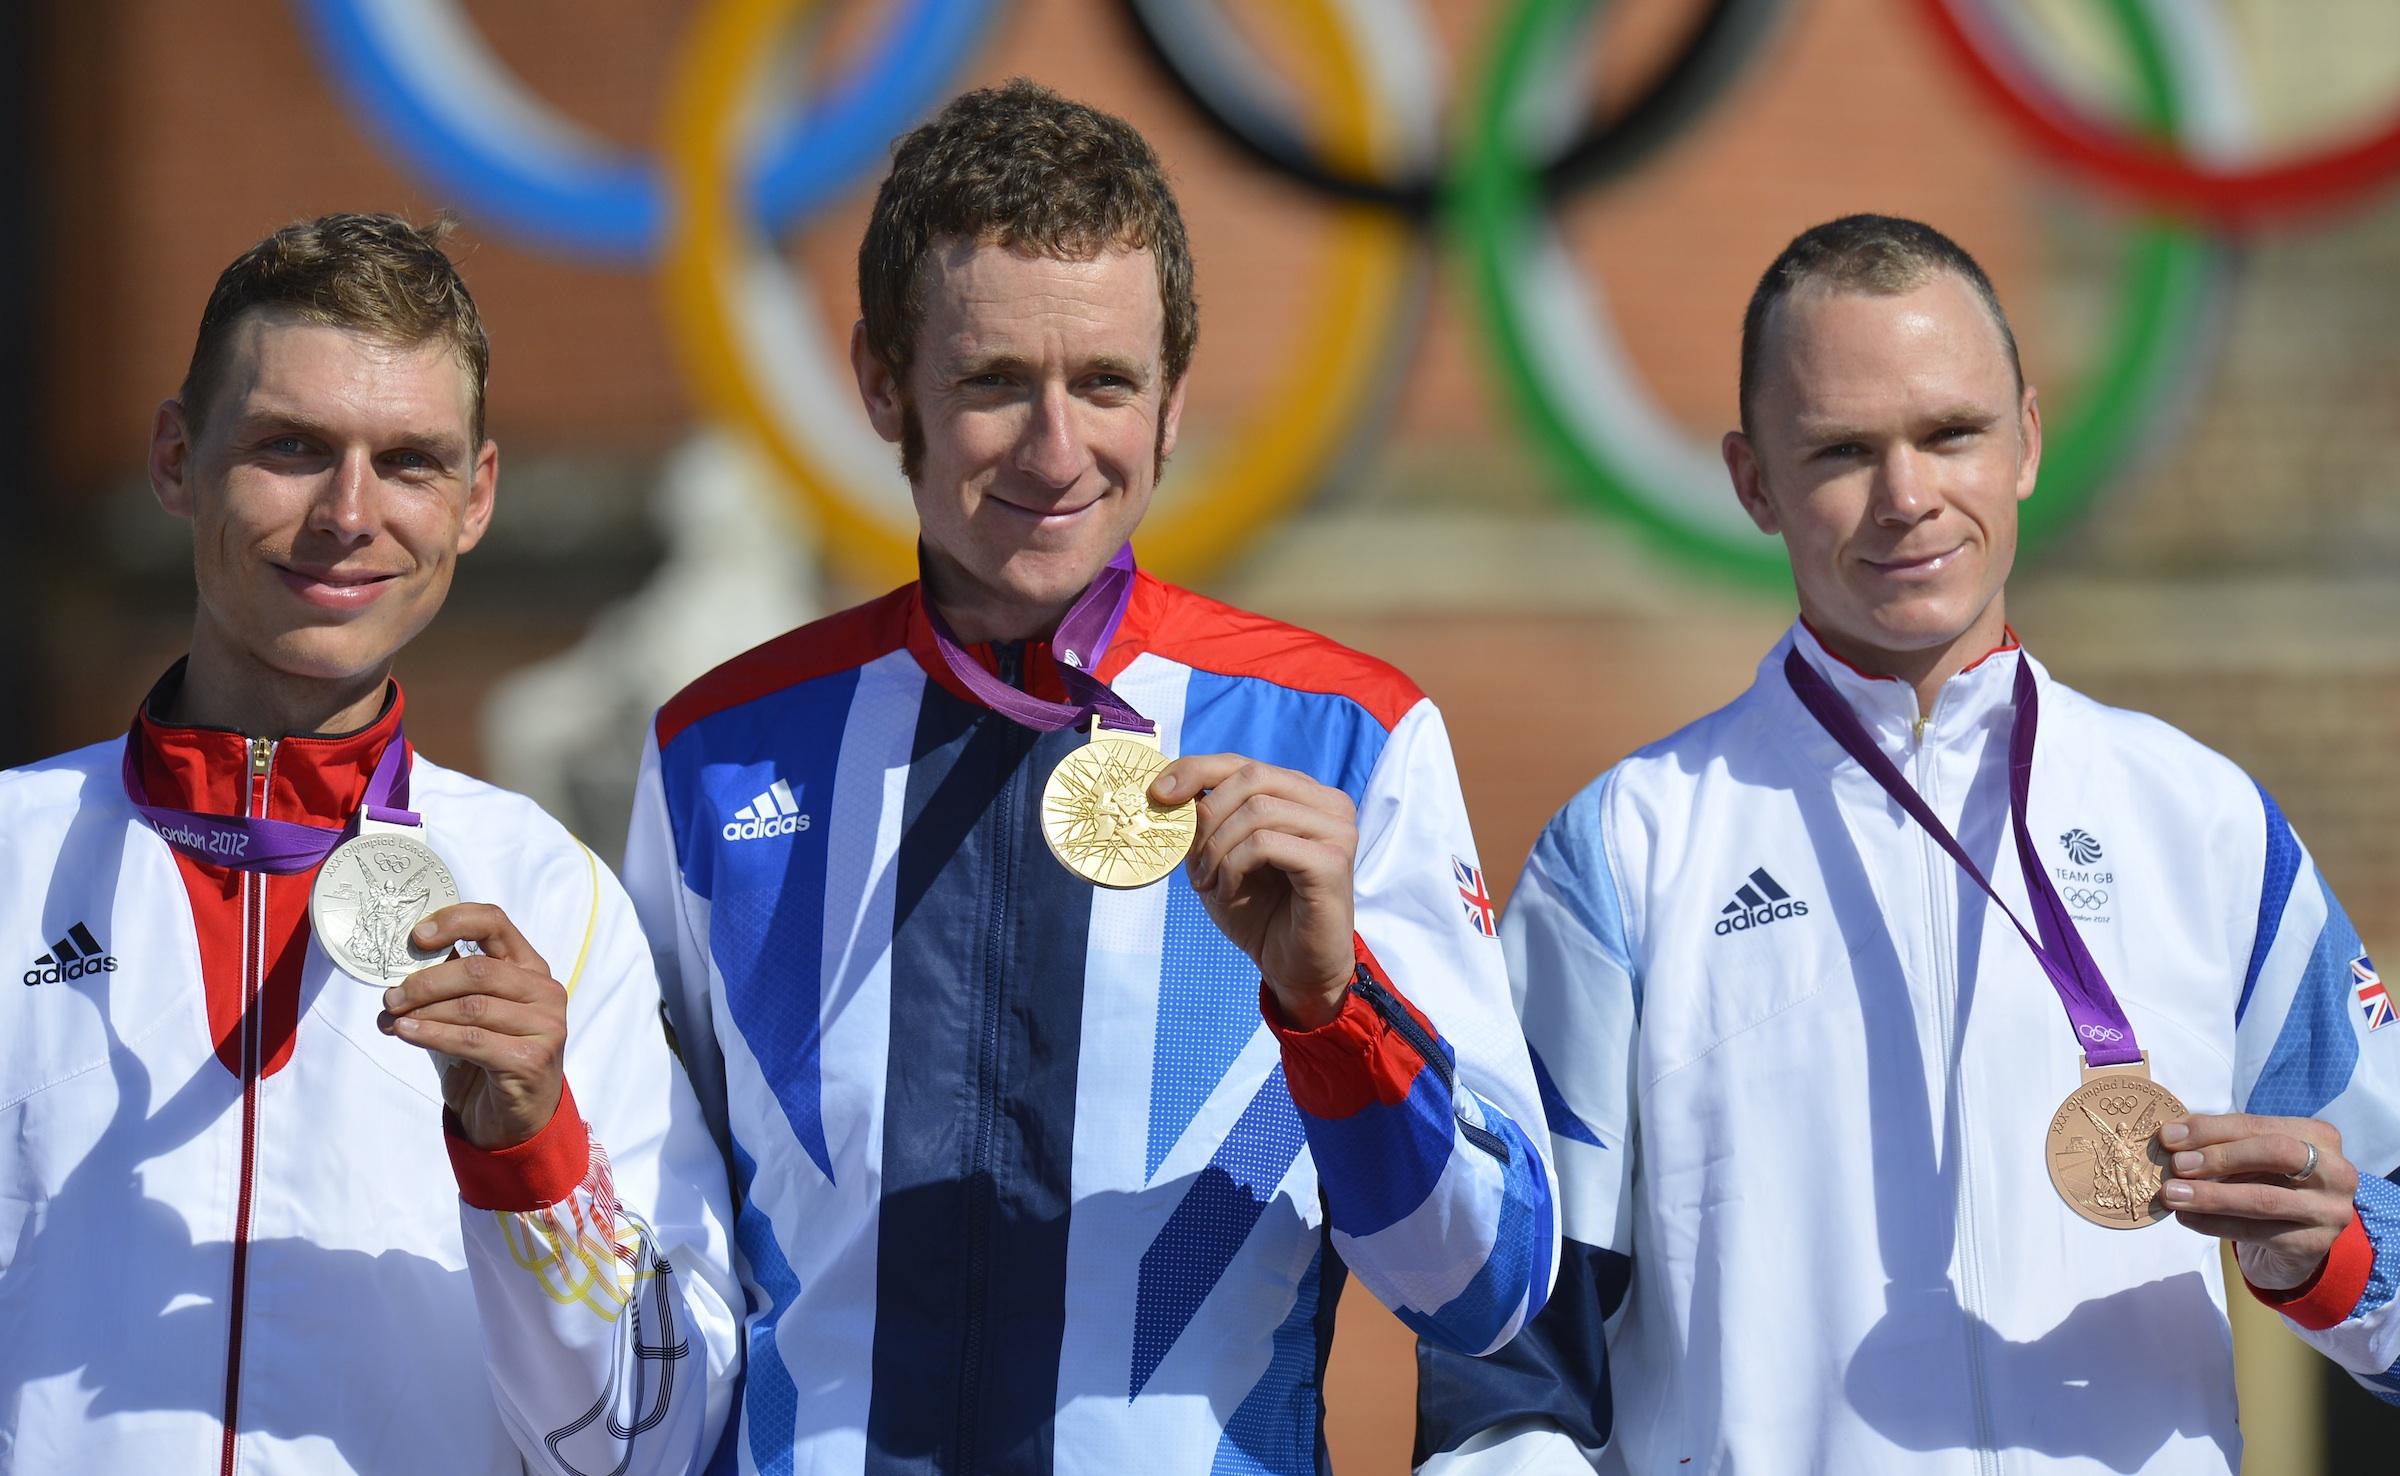 Bradley Wiggins, Chris Froome, Tony Martin, Olympic time trial, podium, London 2012, pic: ©Sirotti